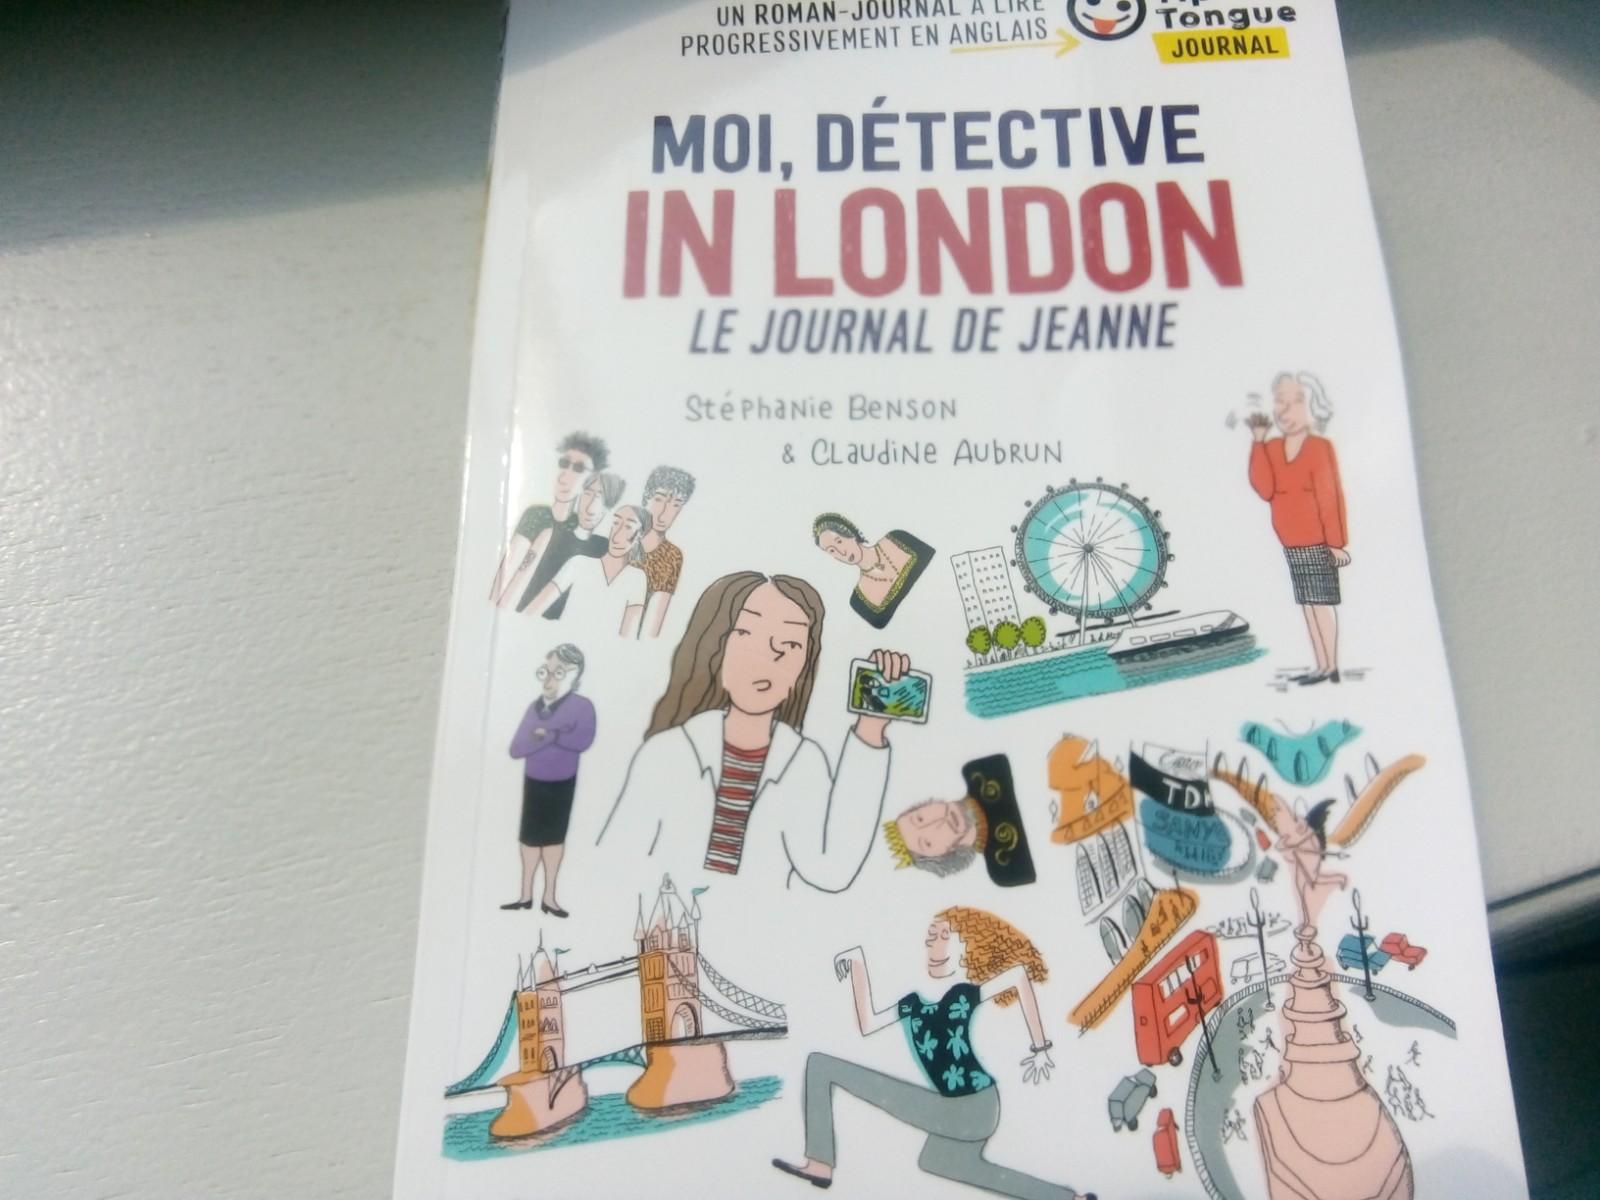 Moi Detective In London Un Roman Journal A Lire